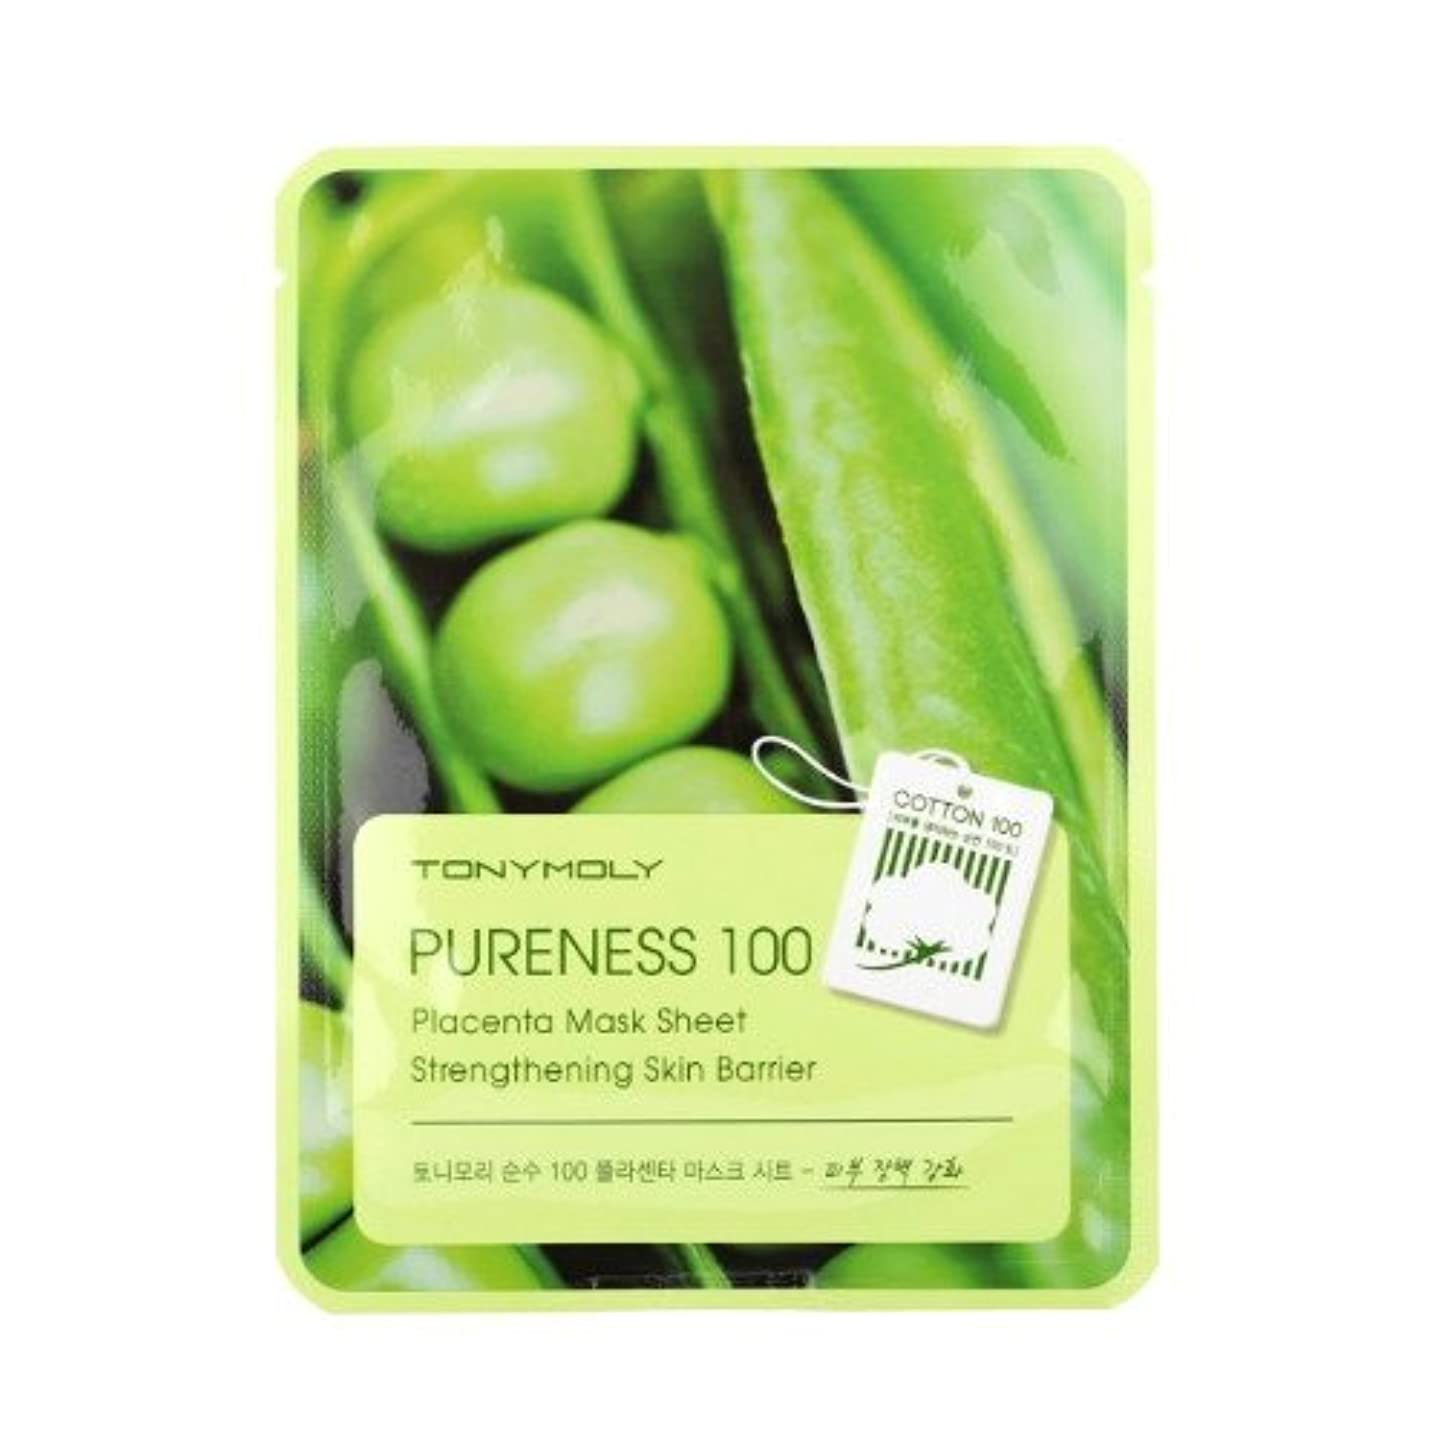 (3 Pack) TONYMOLY Pureness 100 Placenta Mask Sheet Strengthening Skin Barrier (並行輸入品)